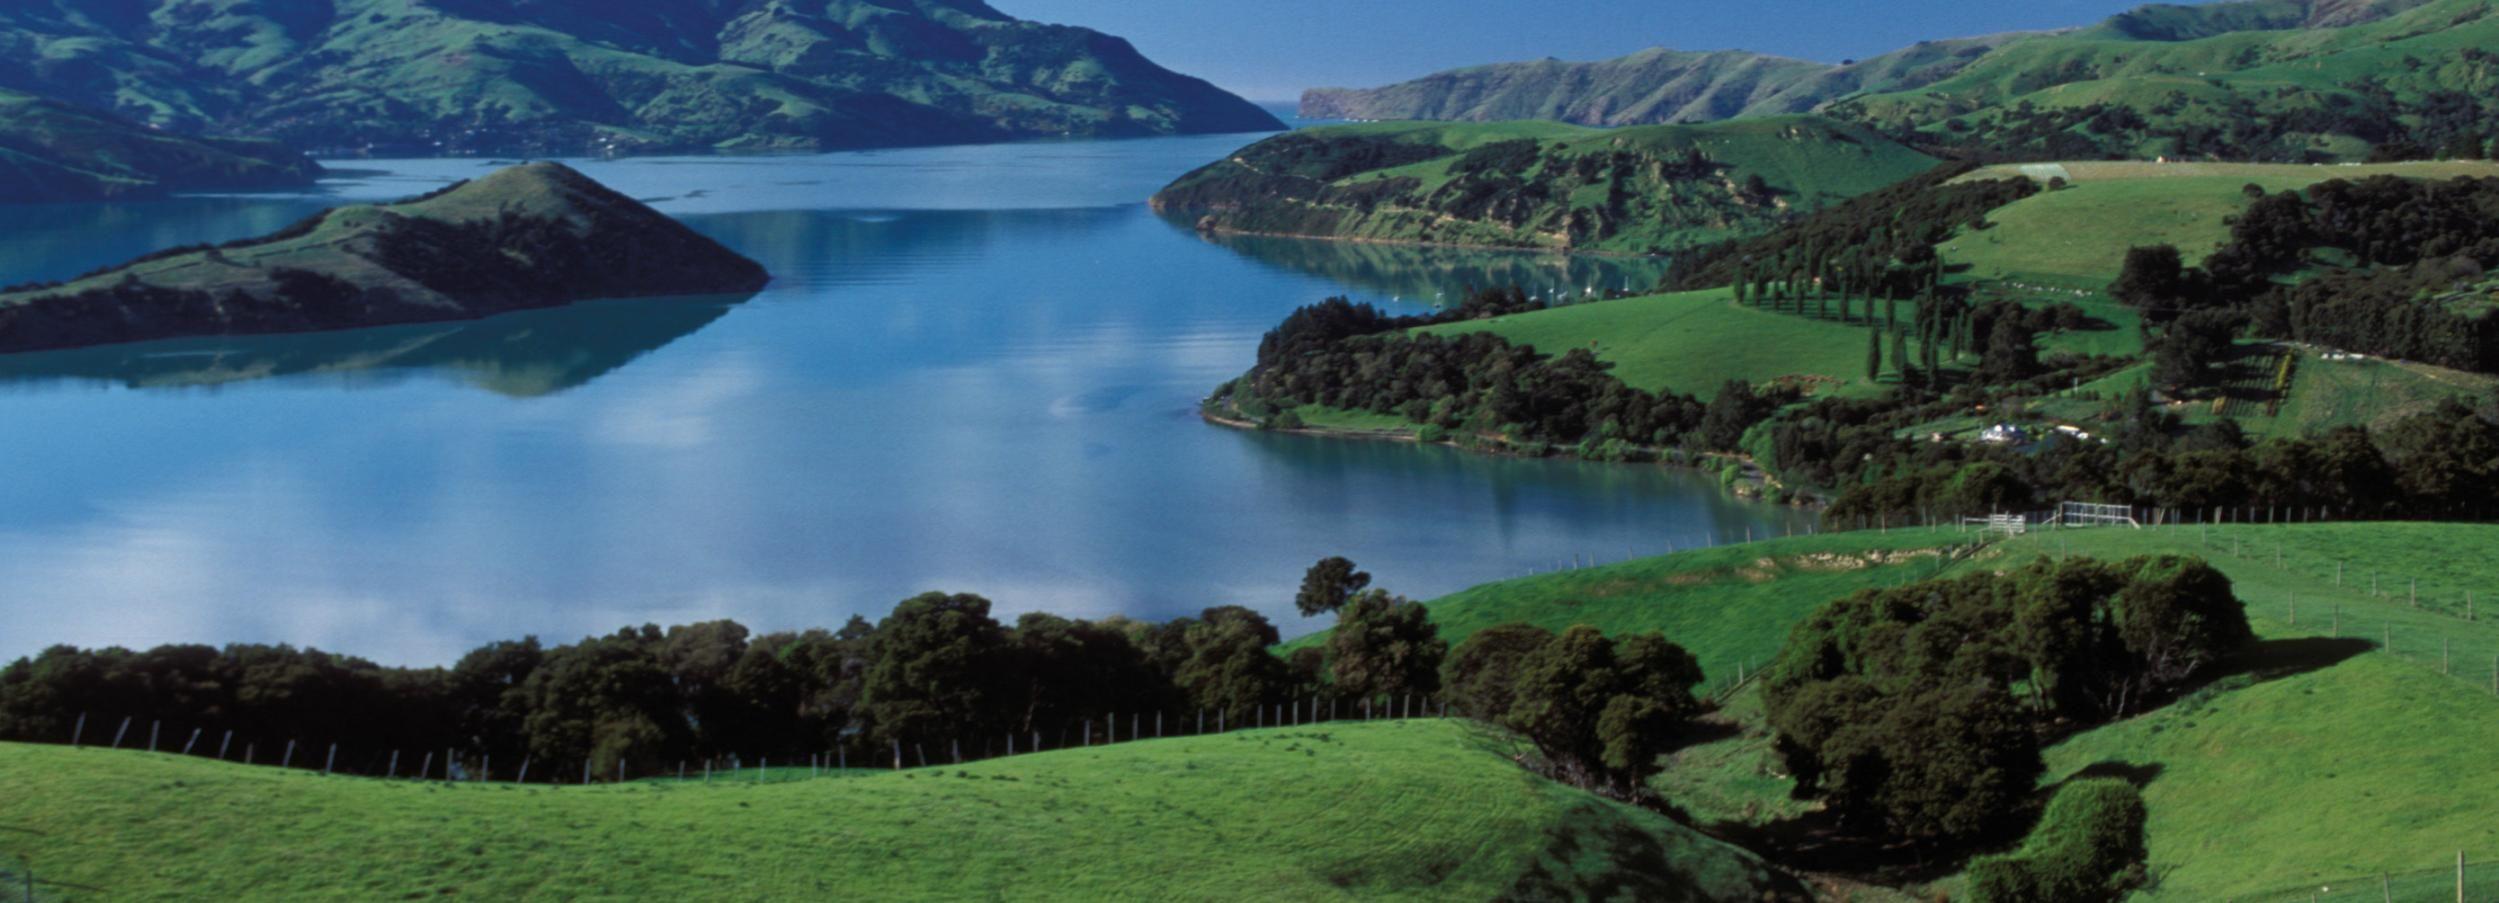 Akaroa-dagtour met havencruise vanuit Christchurch